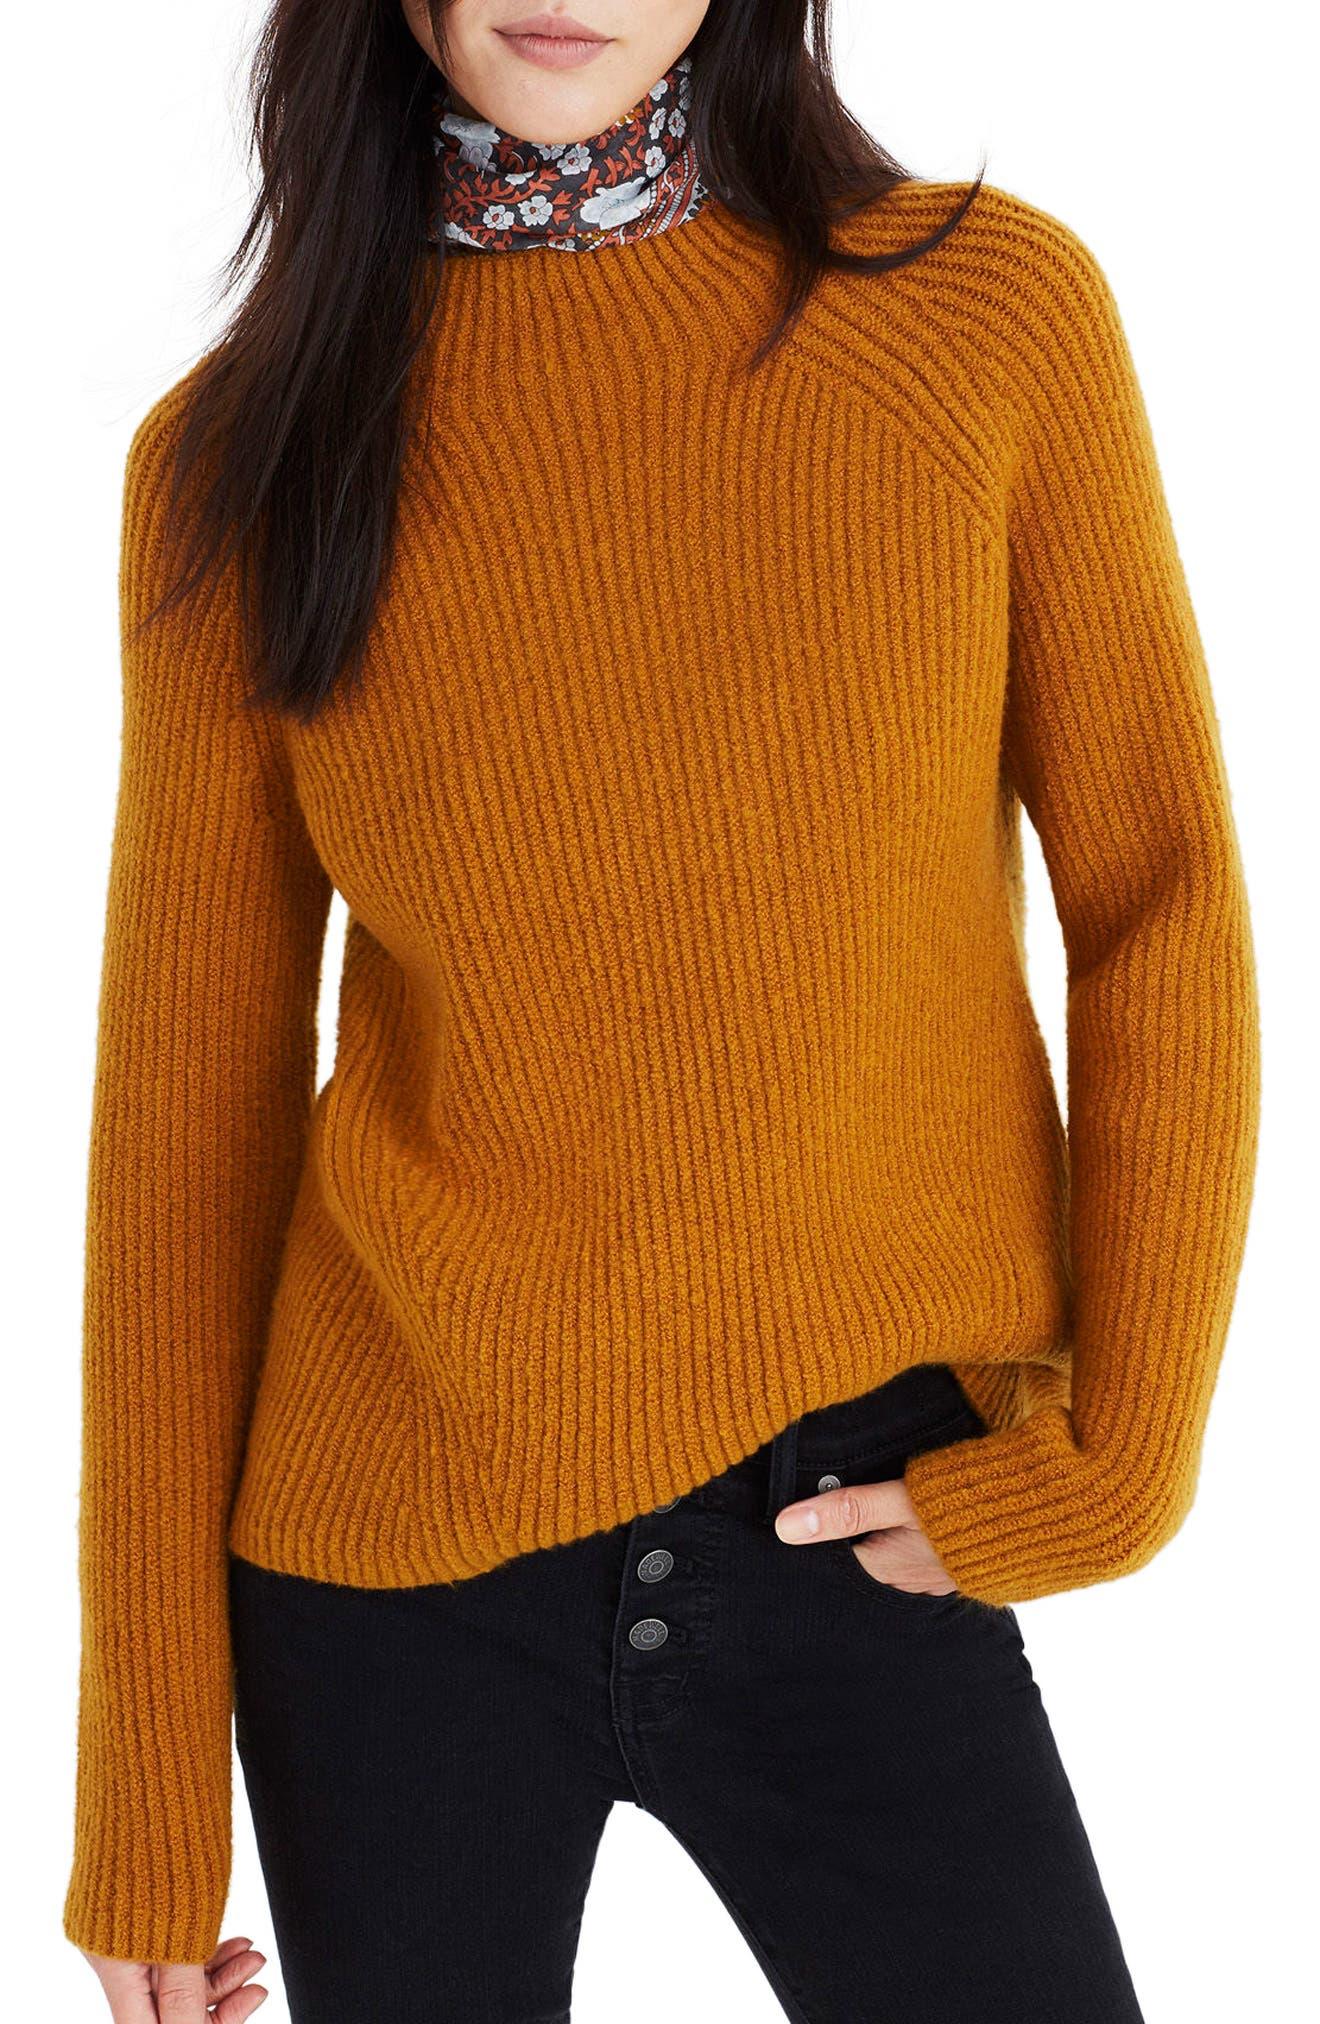 MADEWELL, Northfield Mock Neck Sweater, Main thumbnail 1, color, 800